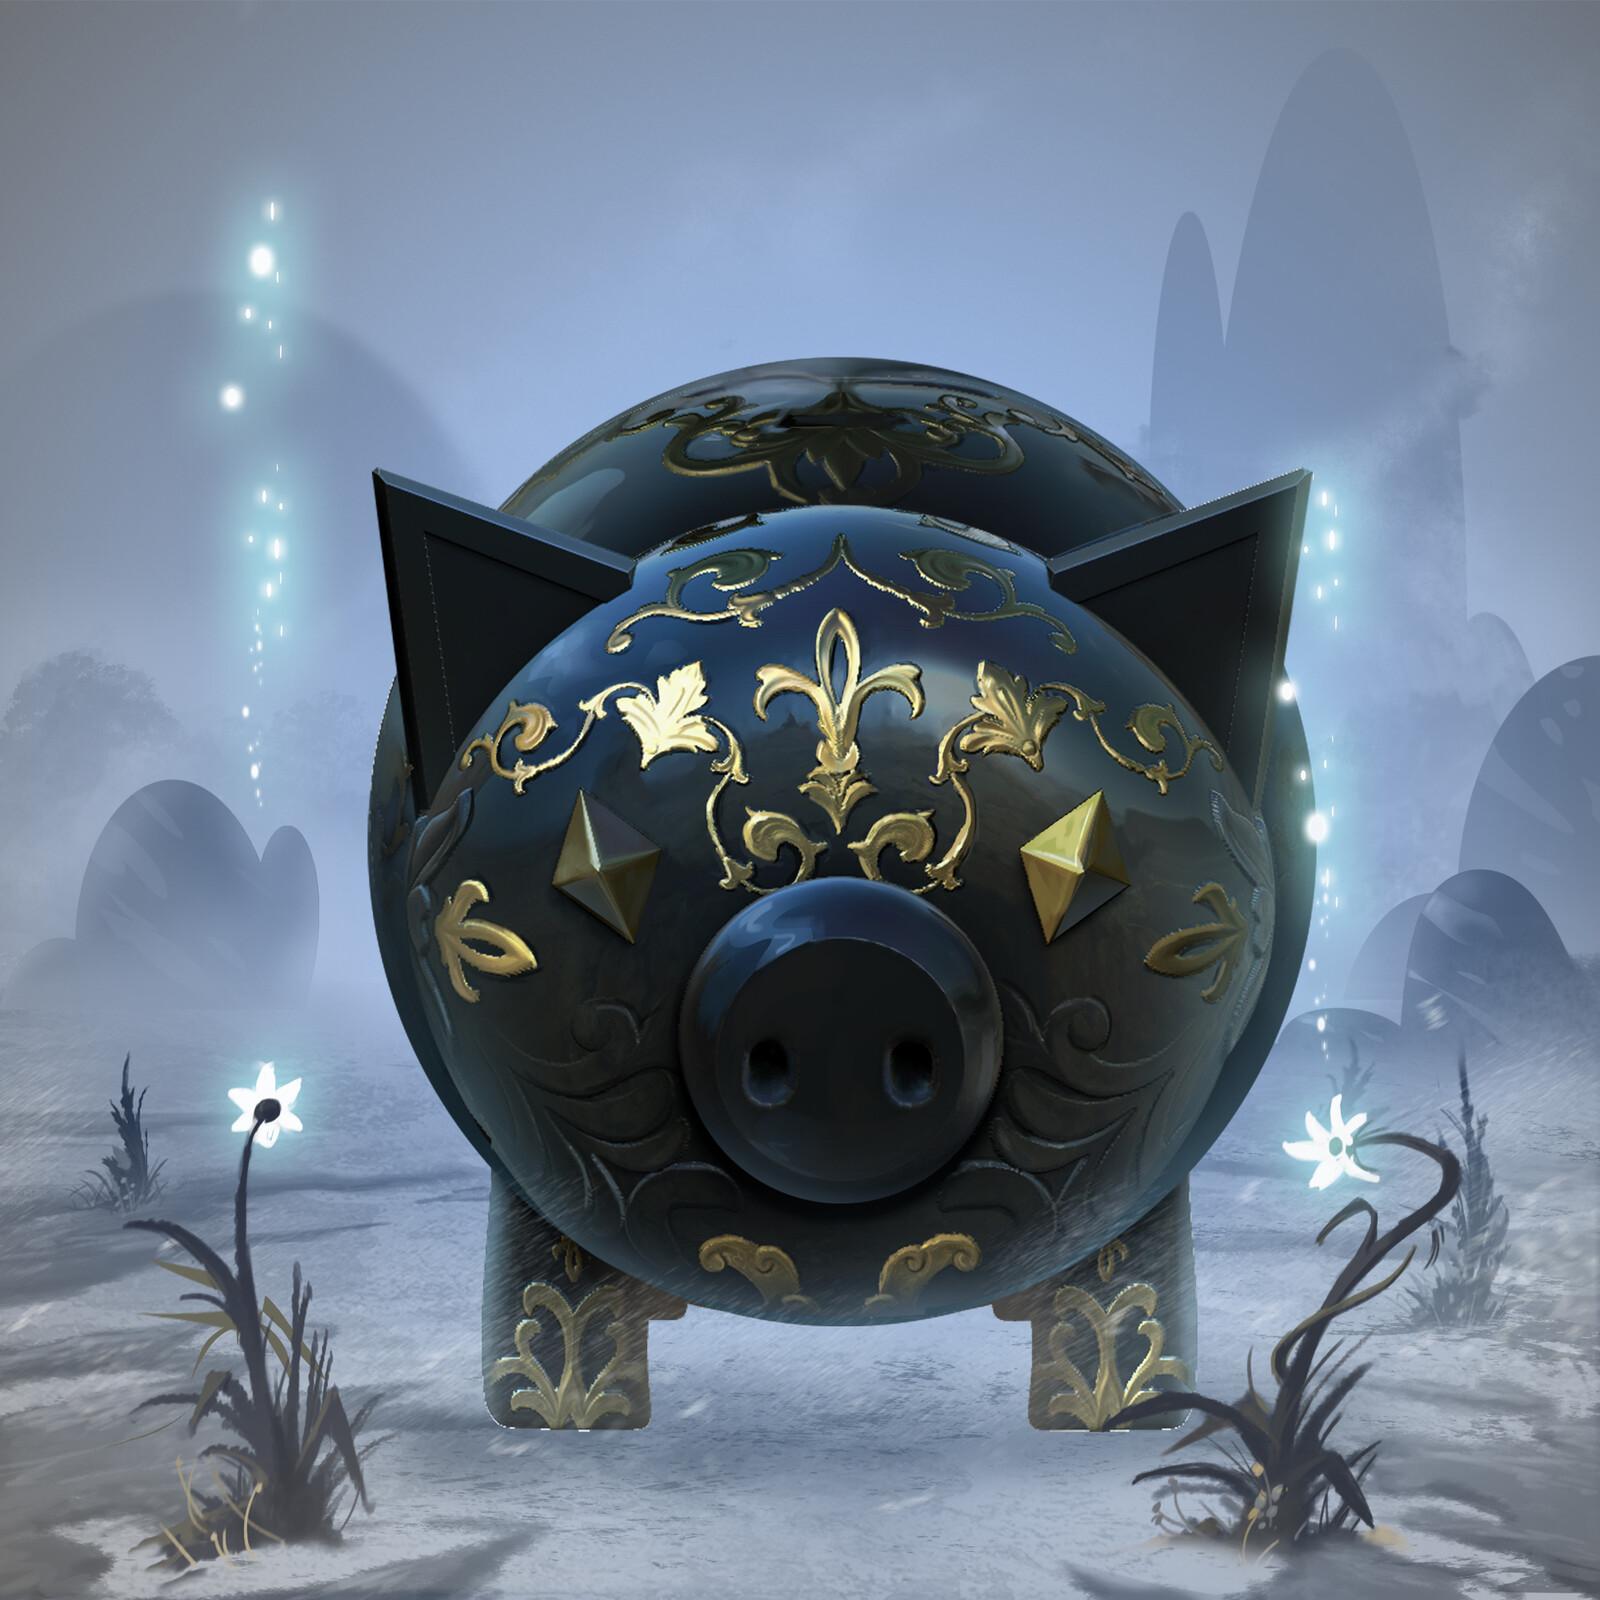 Hexx -Piggy Bank Project